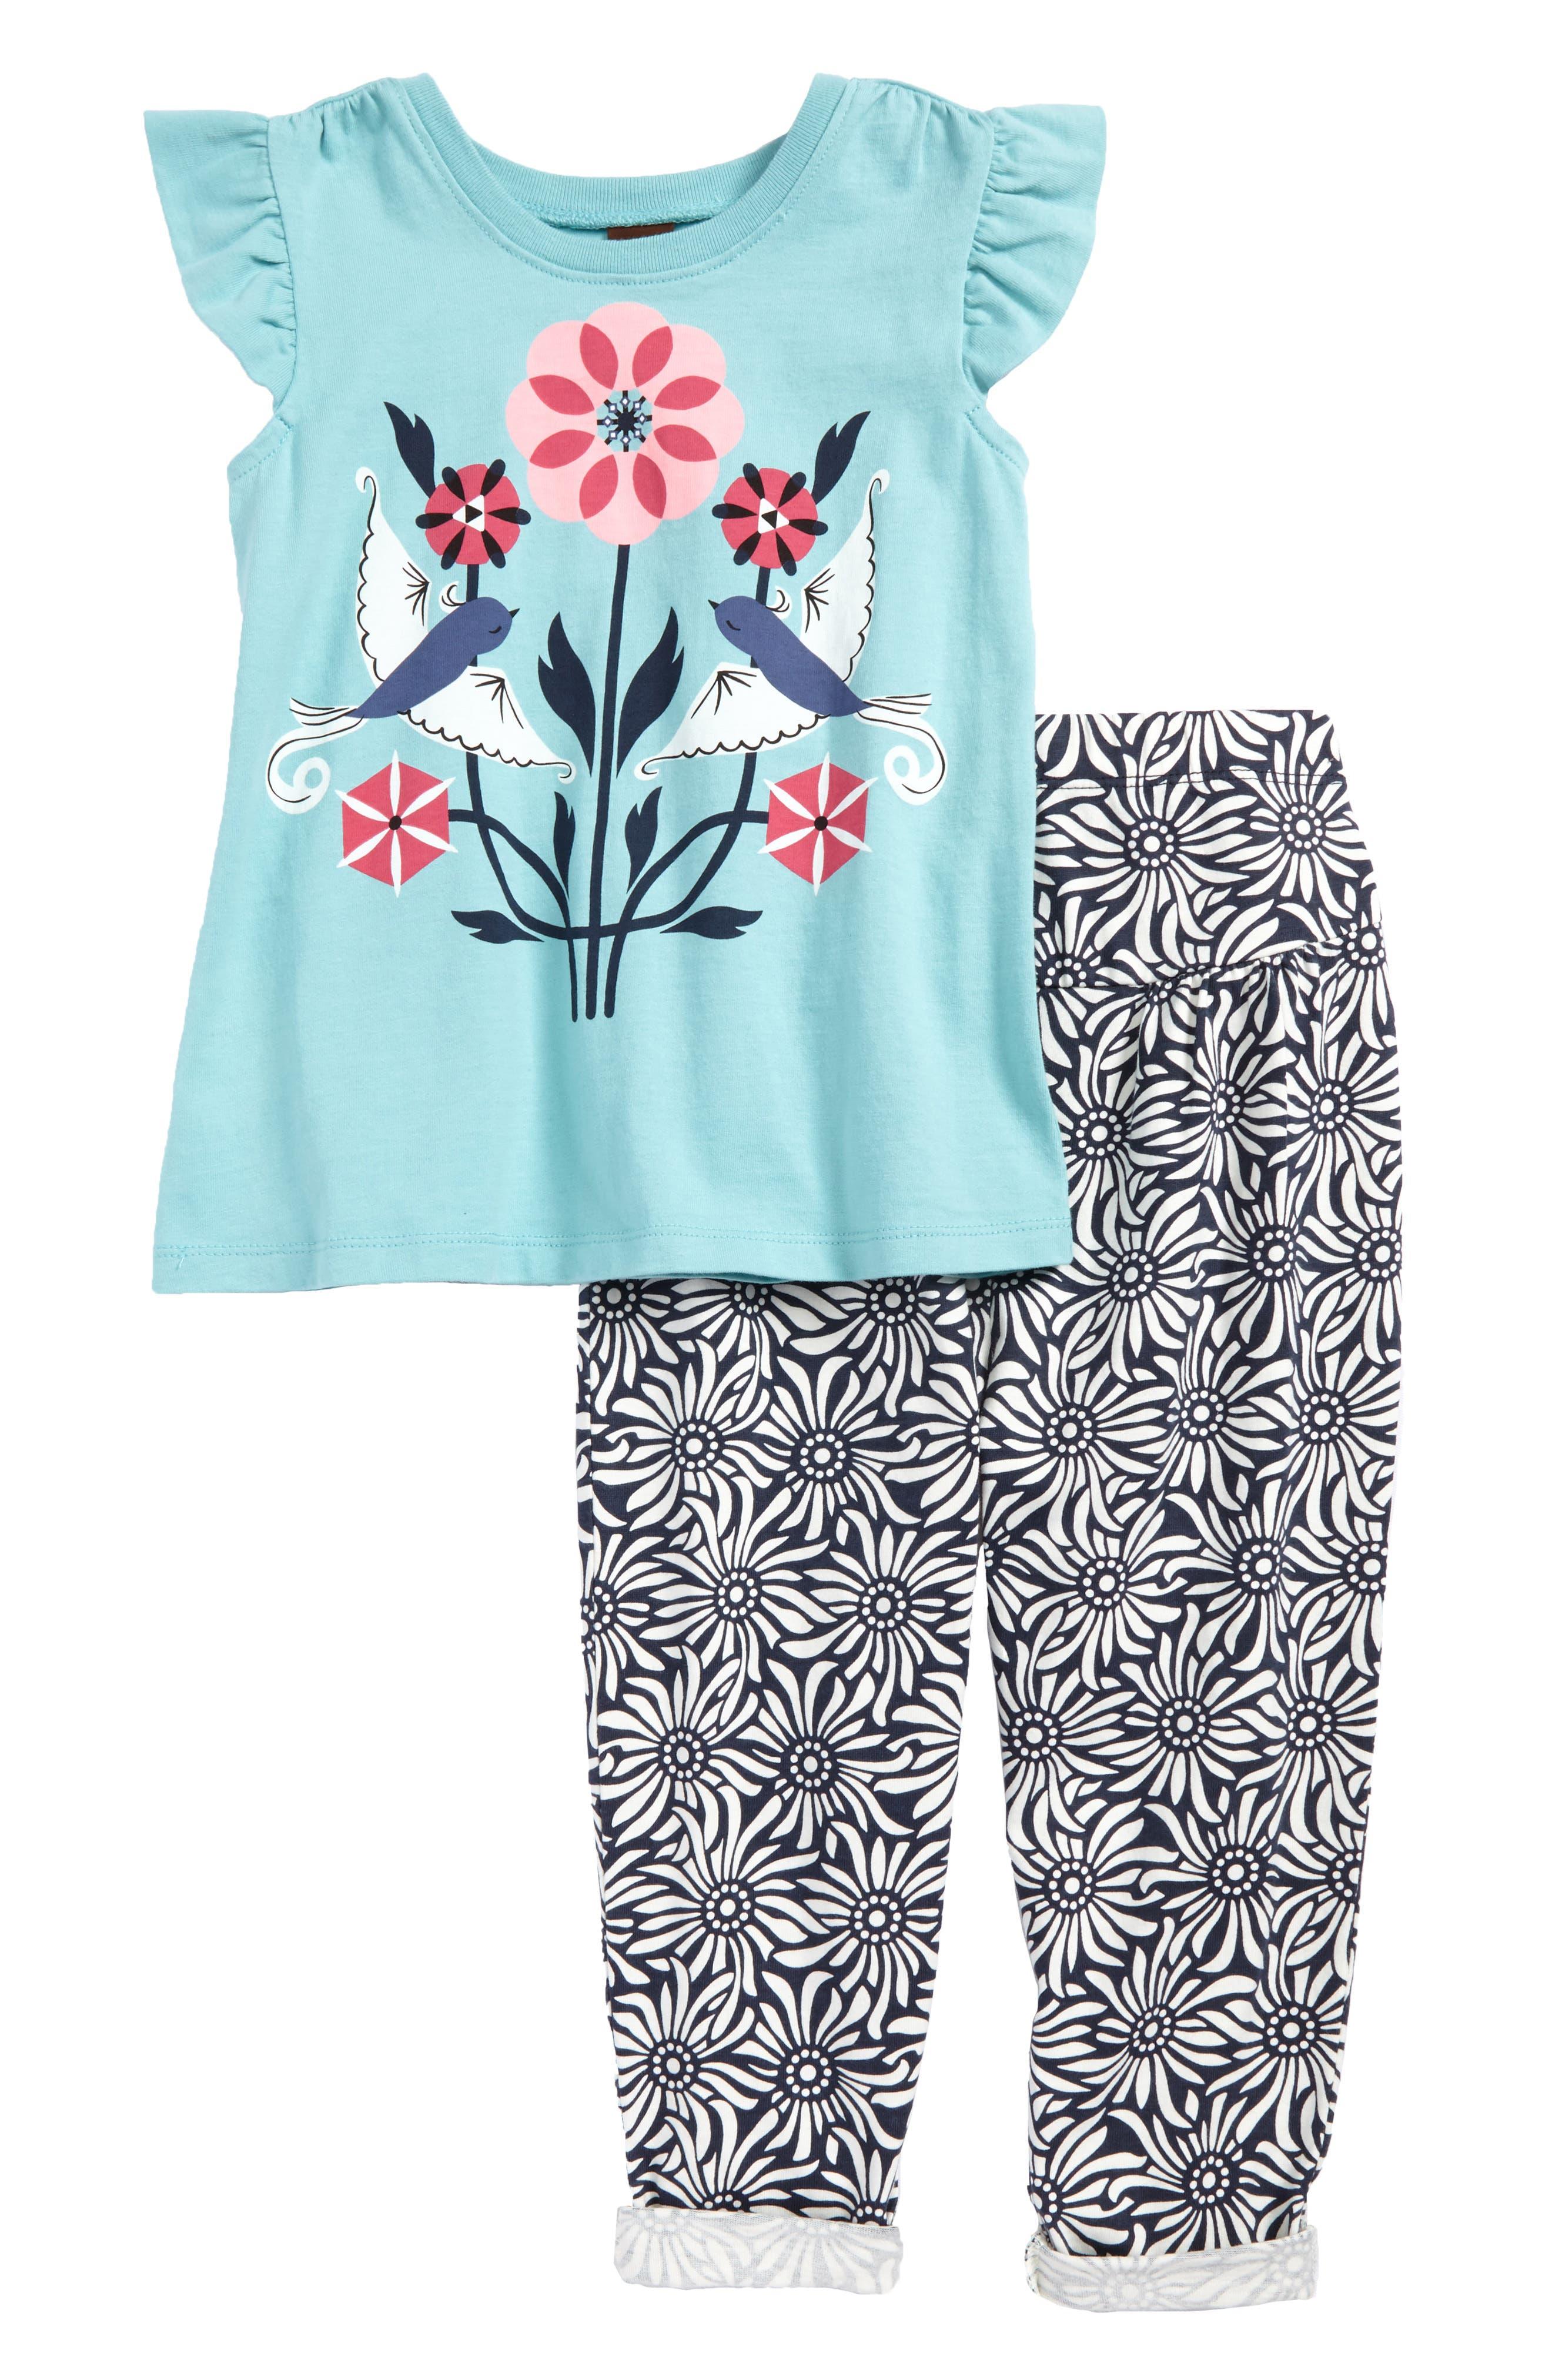 Main Image - Tea Collection Lovebirds Tee & Pants Set (Baby Girls)